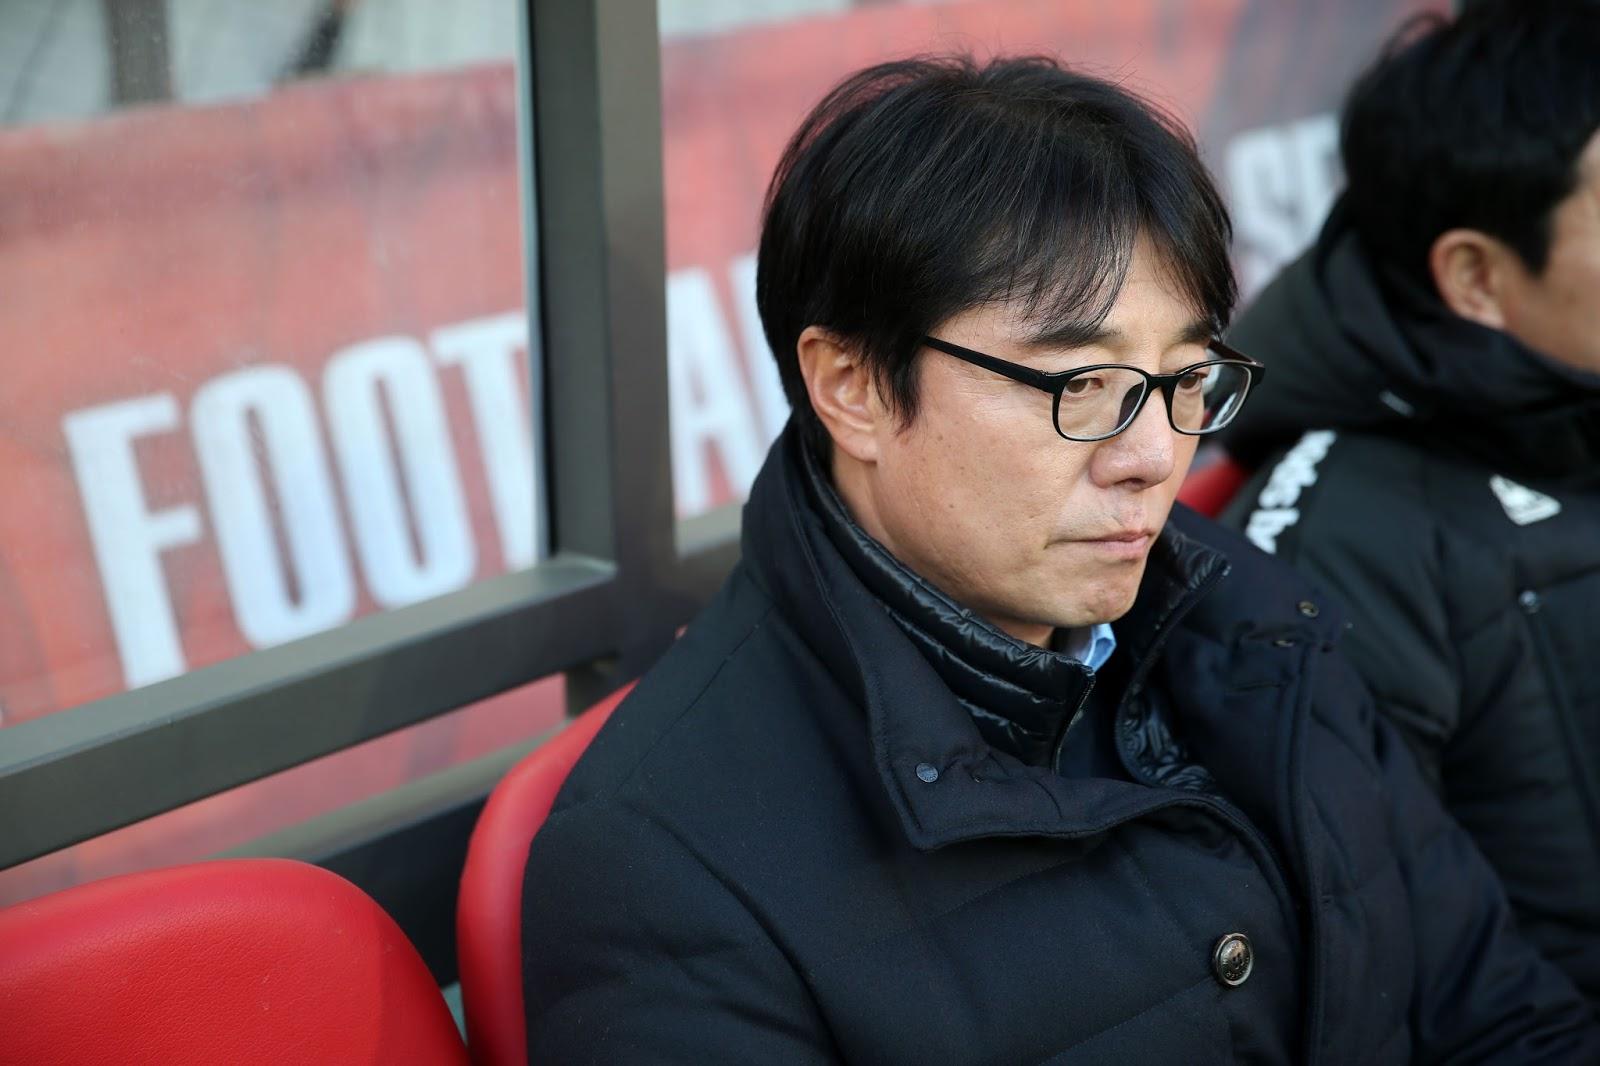 FC Seoul have sacked Hwang Sun-hong